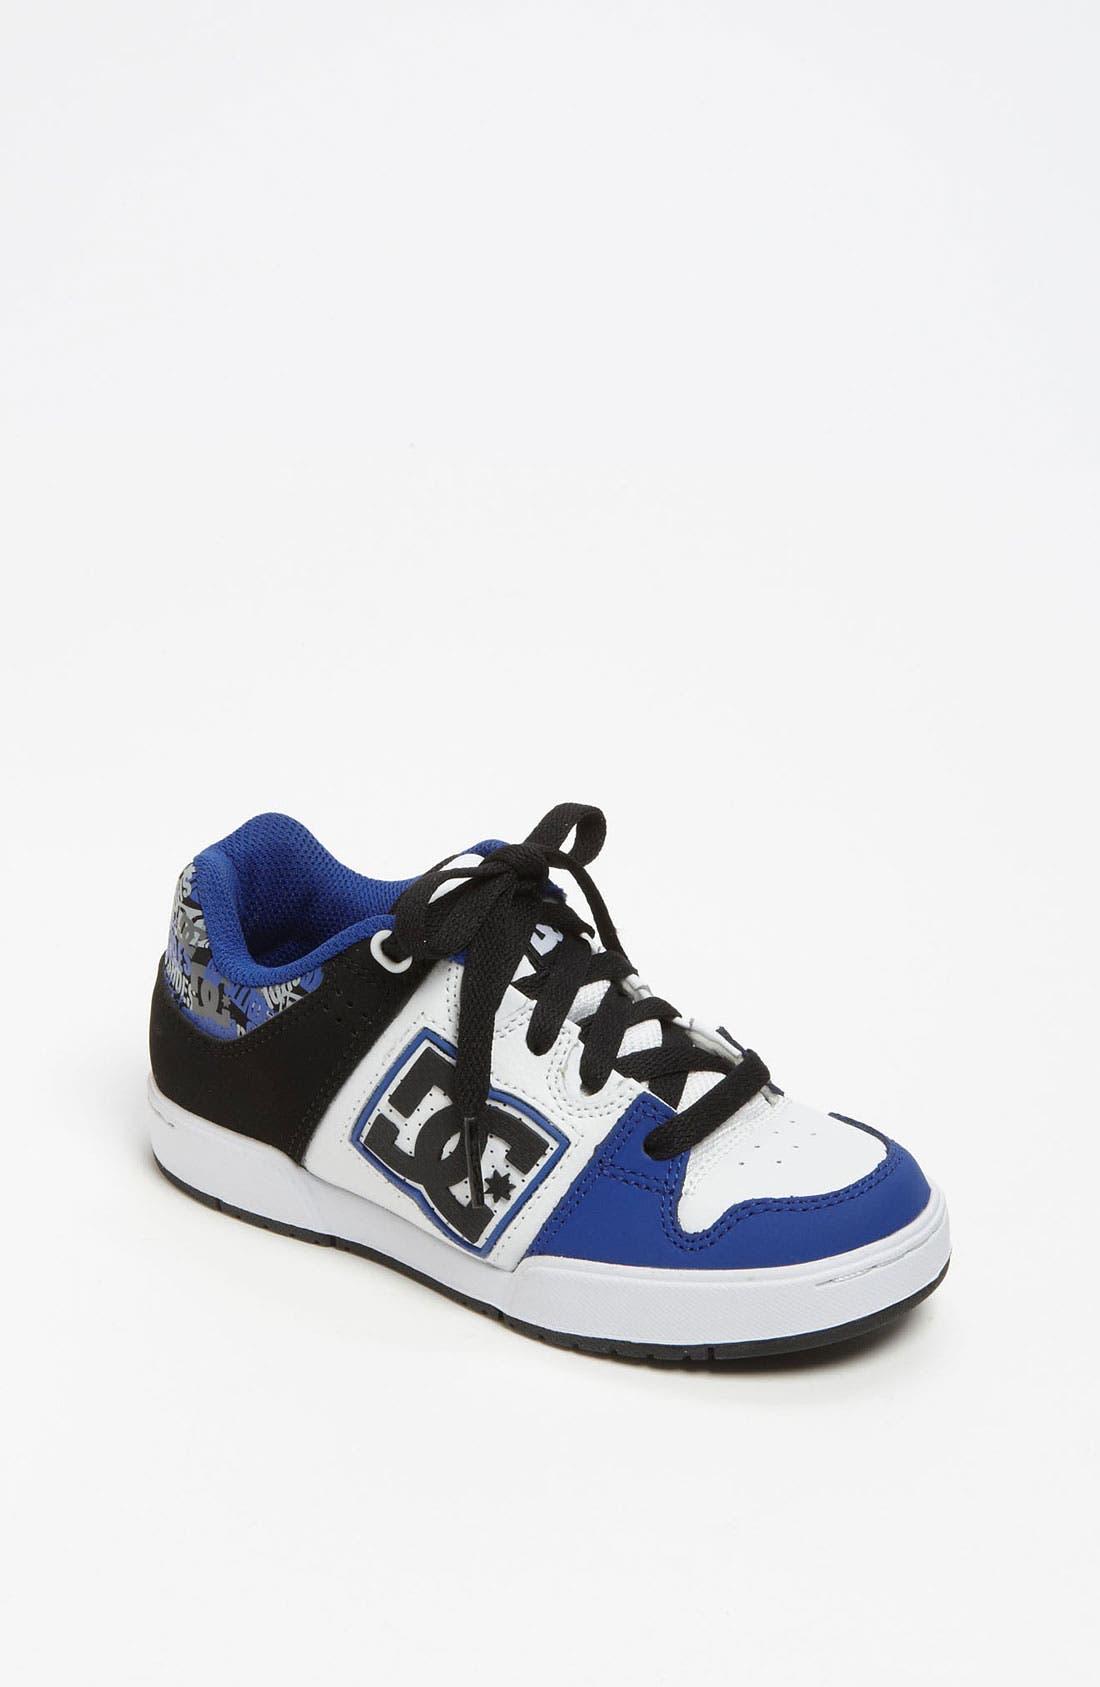 Alternate Image 1 Selected - DC Shoes 'Turbo 2' Sneaker (Little Kid & Big Kid)